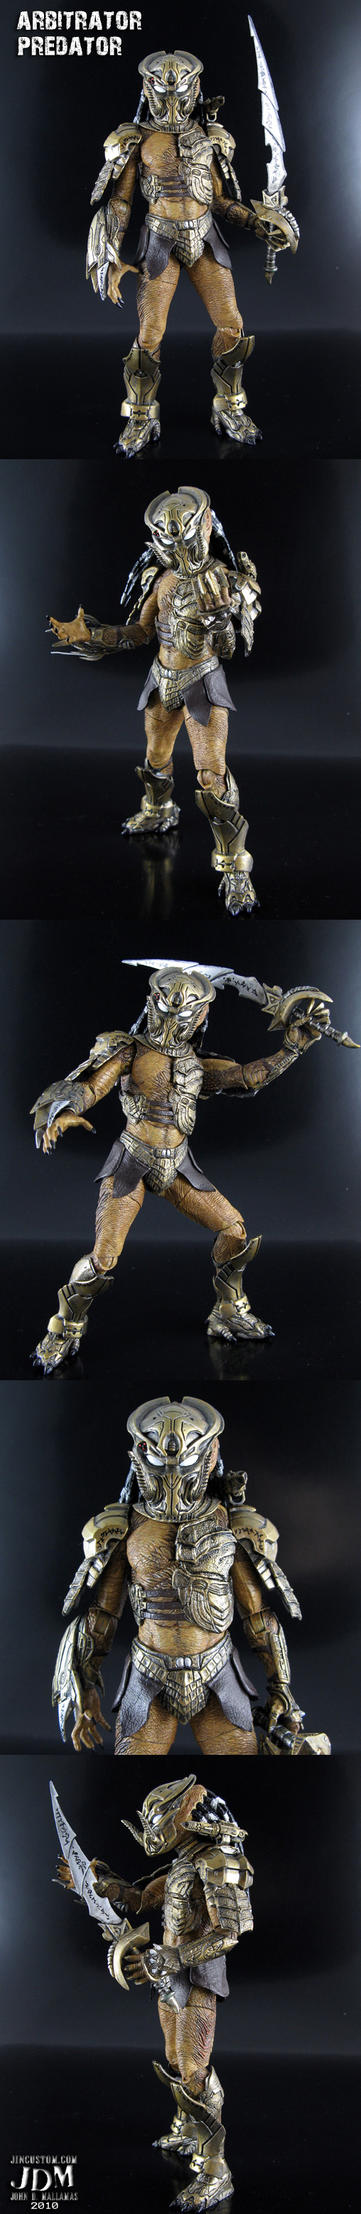 Arbitor Predator by Jin-Saotome